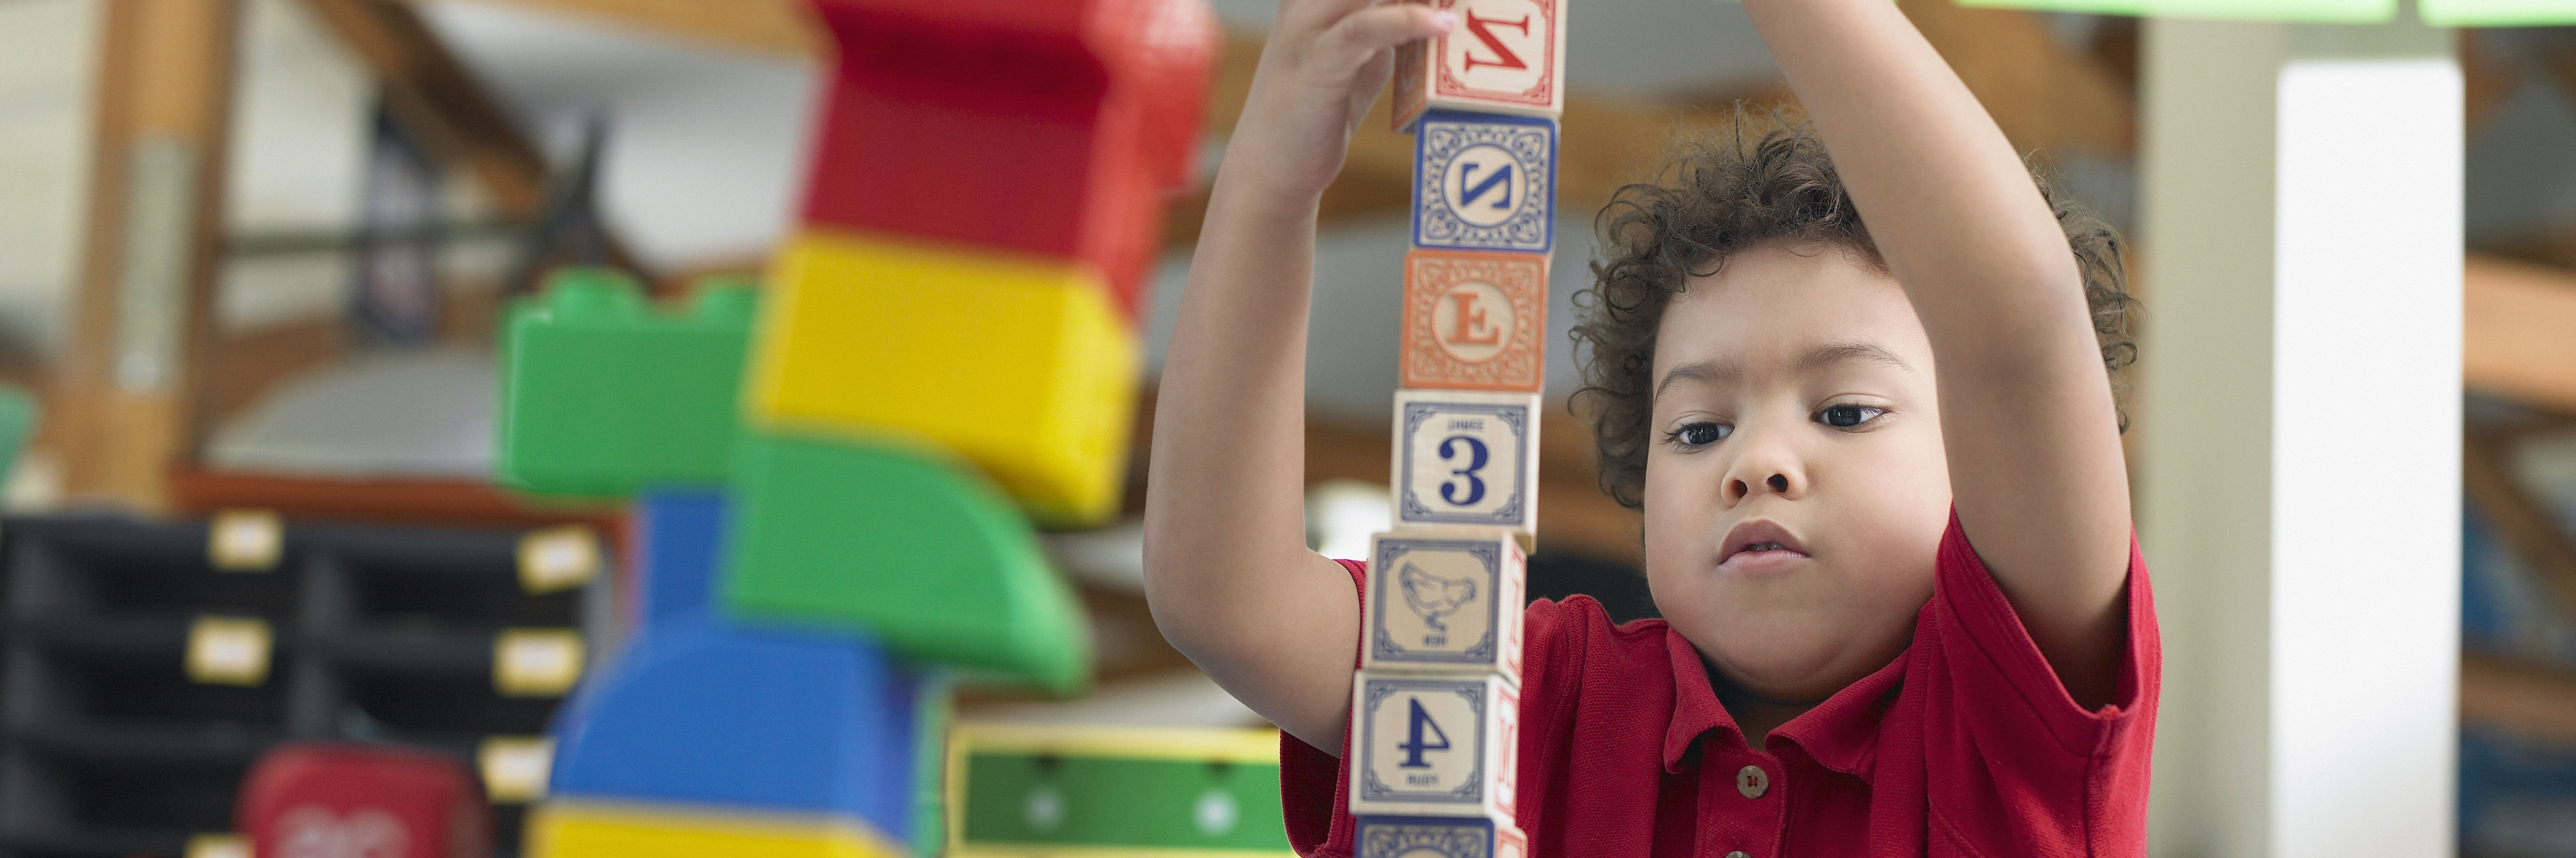 boy building blocks tower